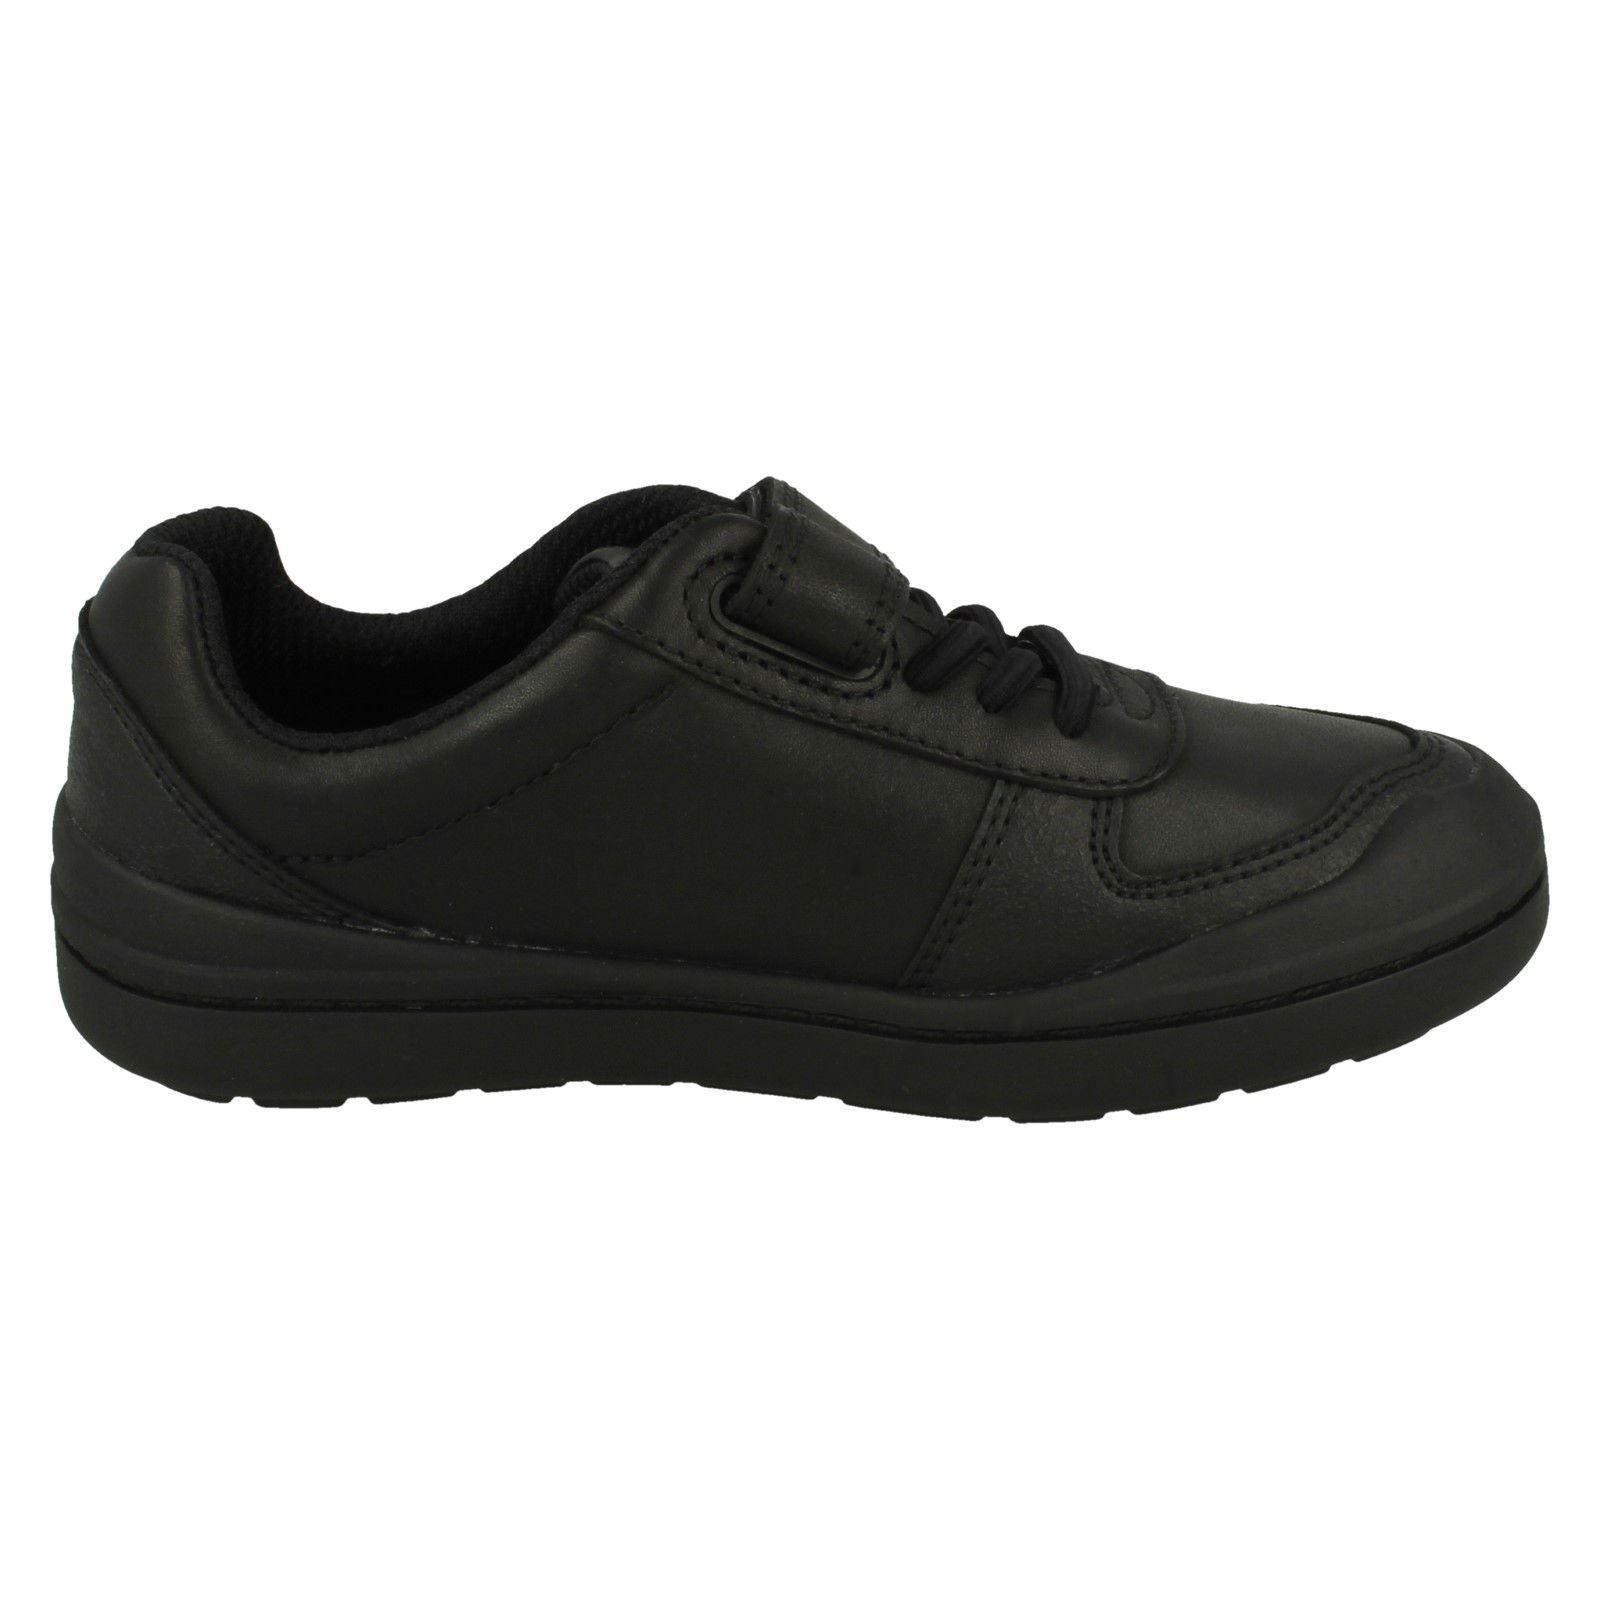 Smart Negro K Rock para Clarks School Verve Zapatos niños 8g65qWw